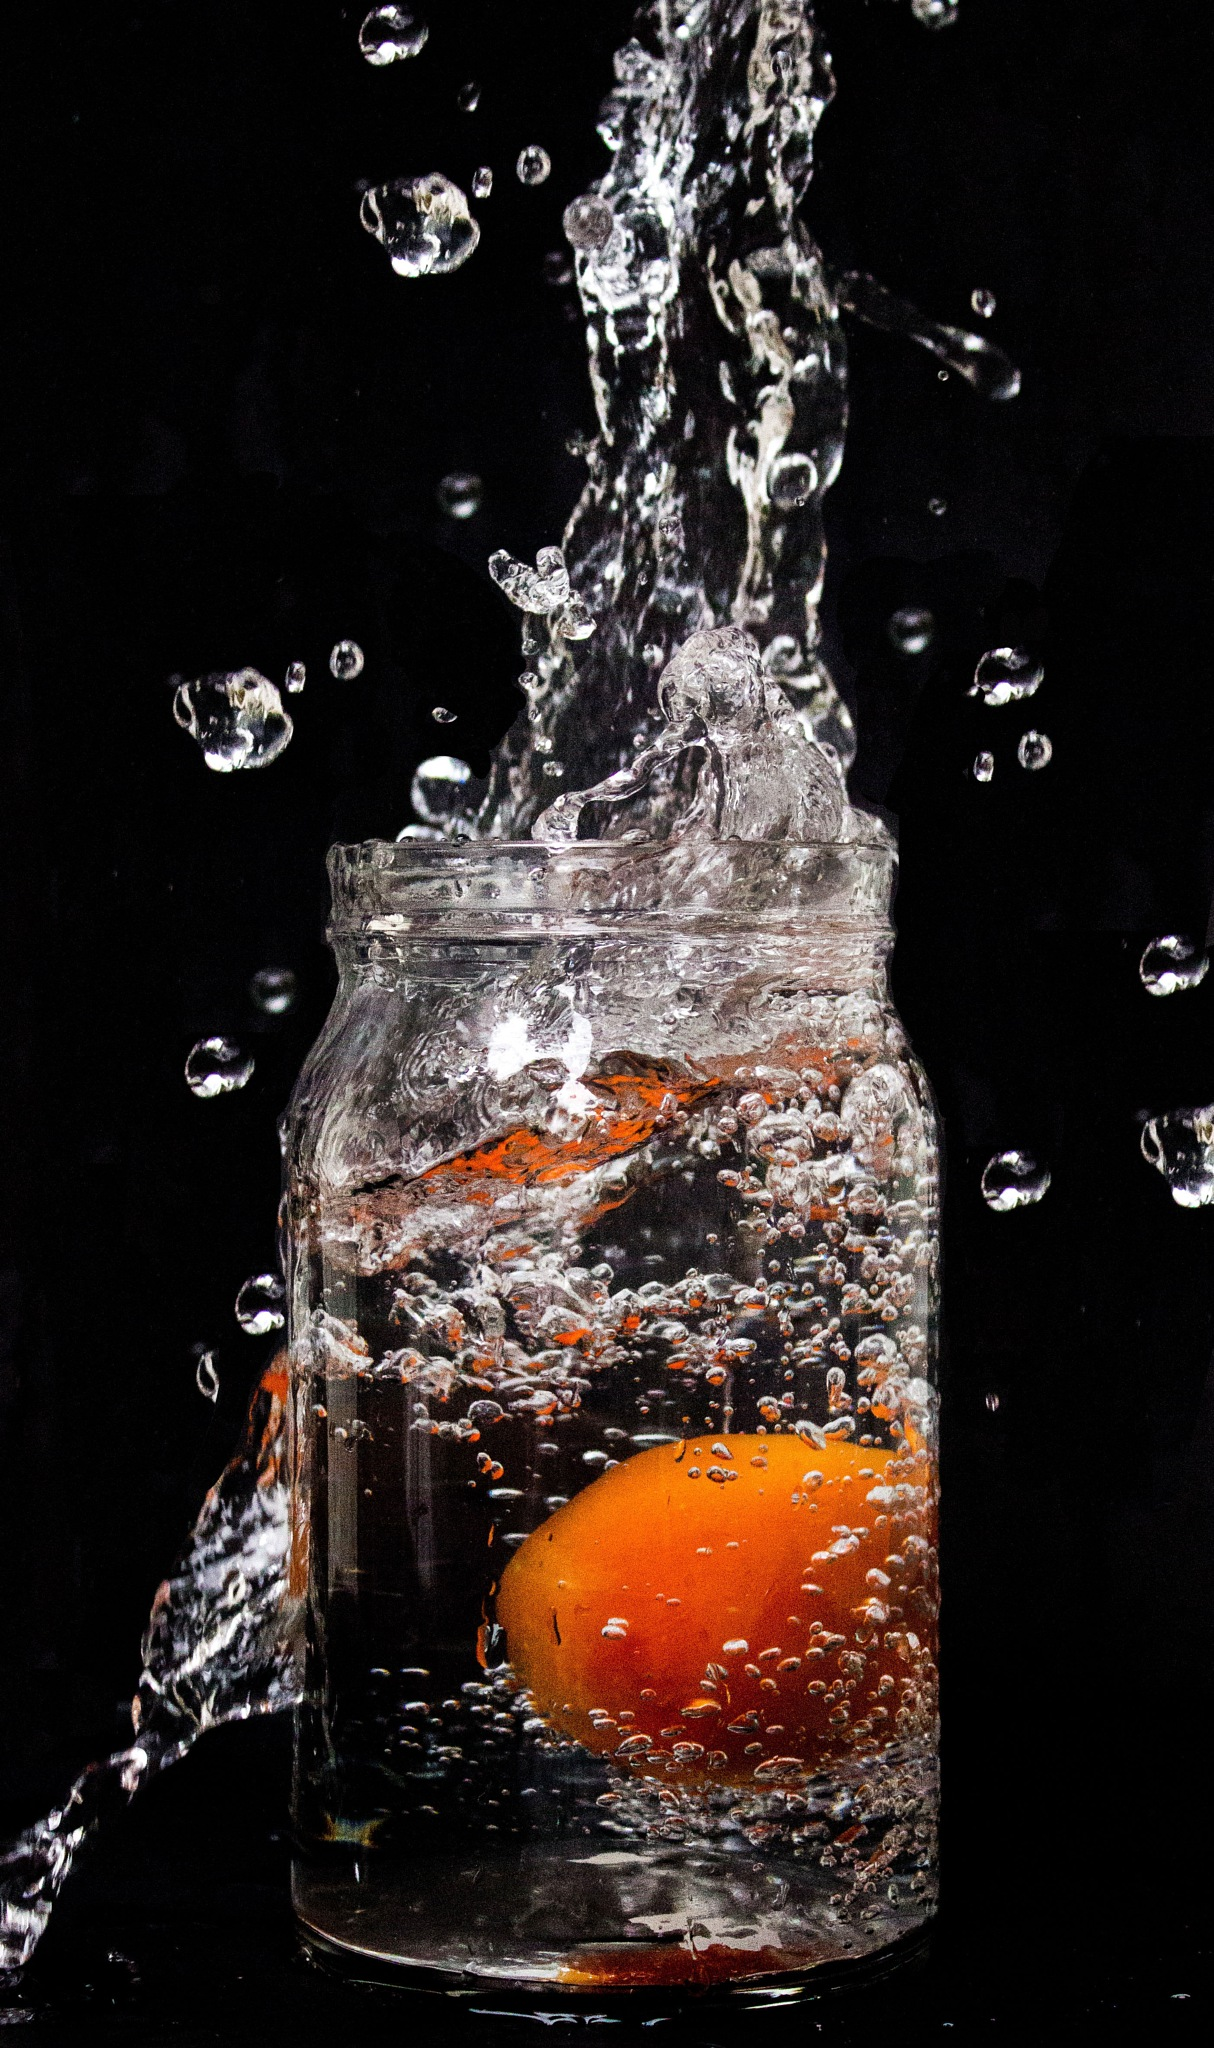 Splash! by zxjellydonutxz